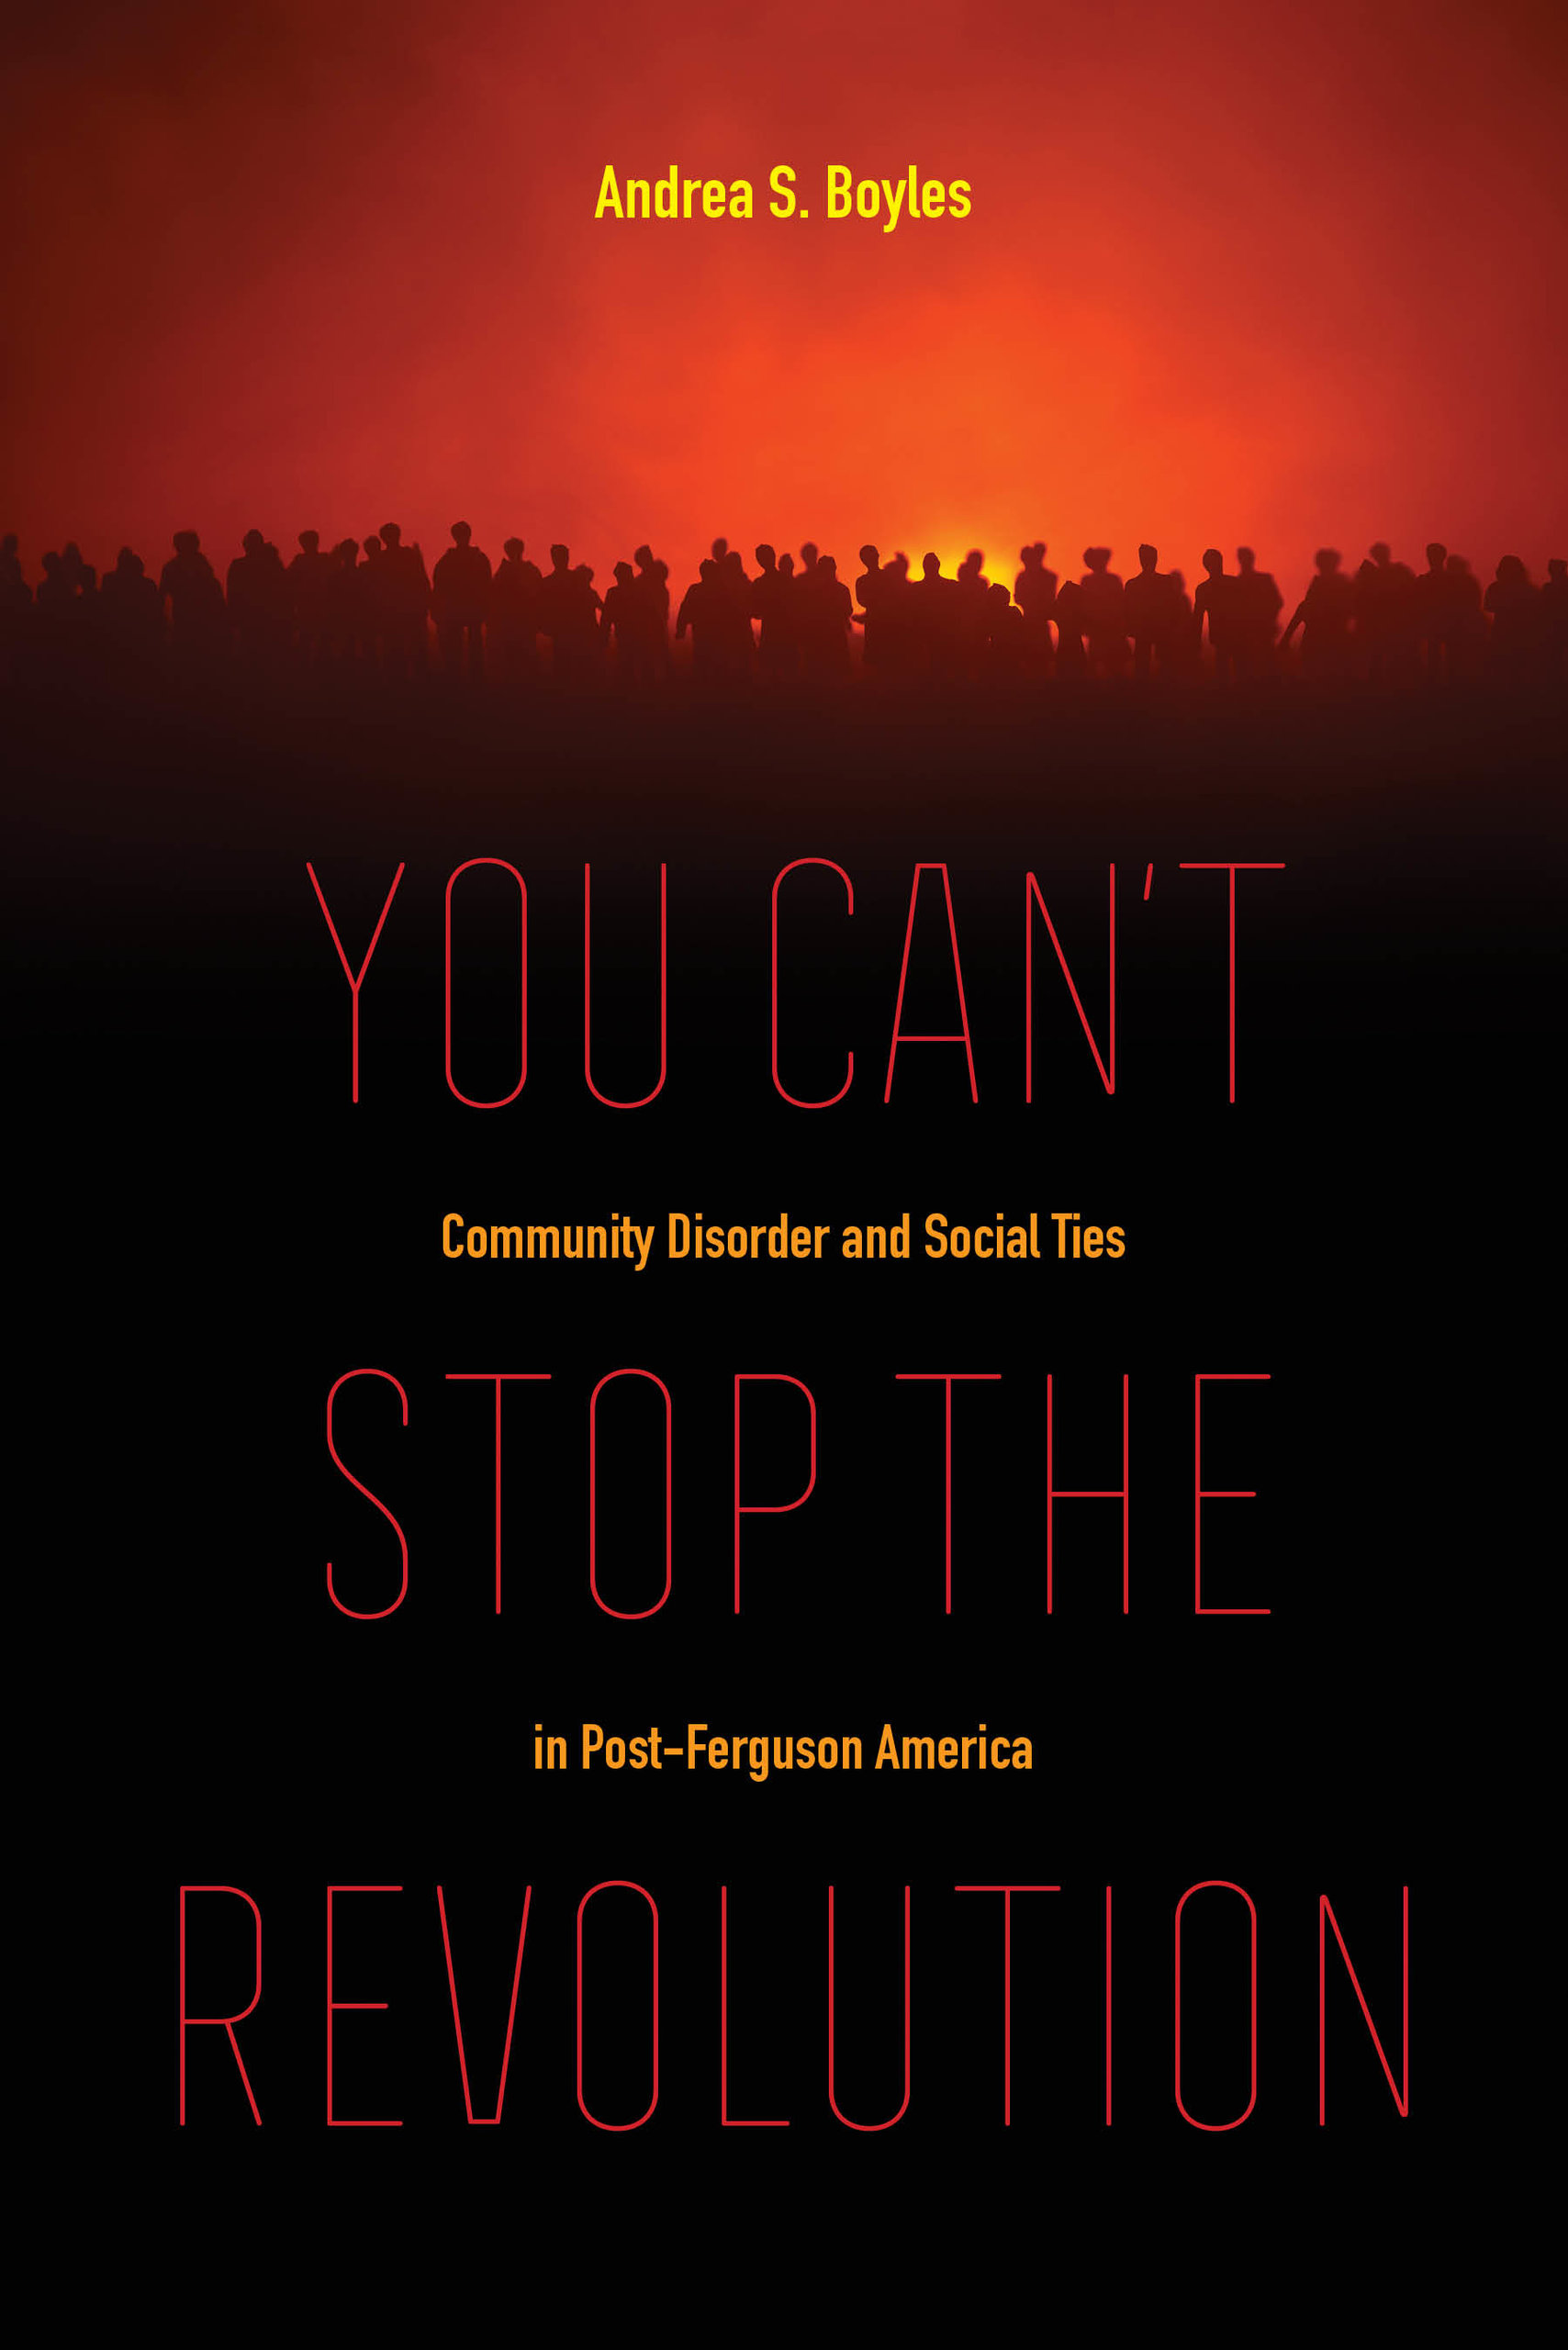 the Revolution by Andrea S. Boyles ...